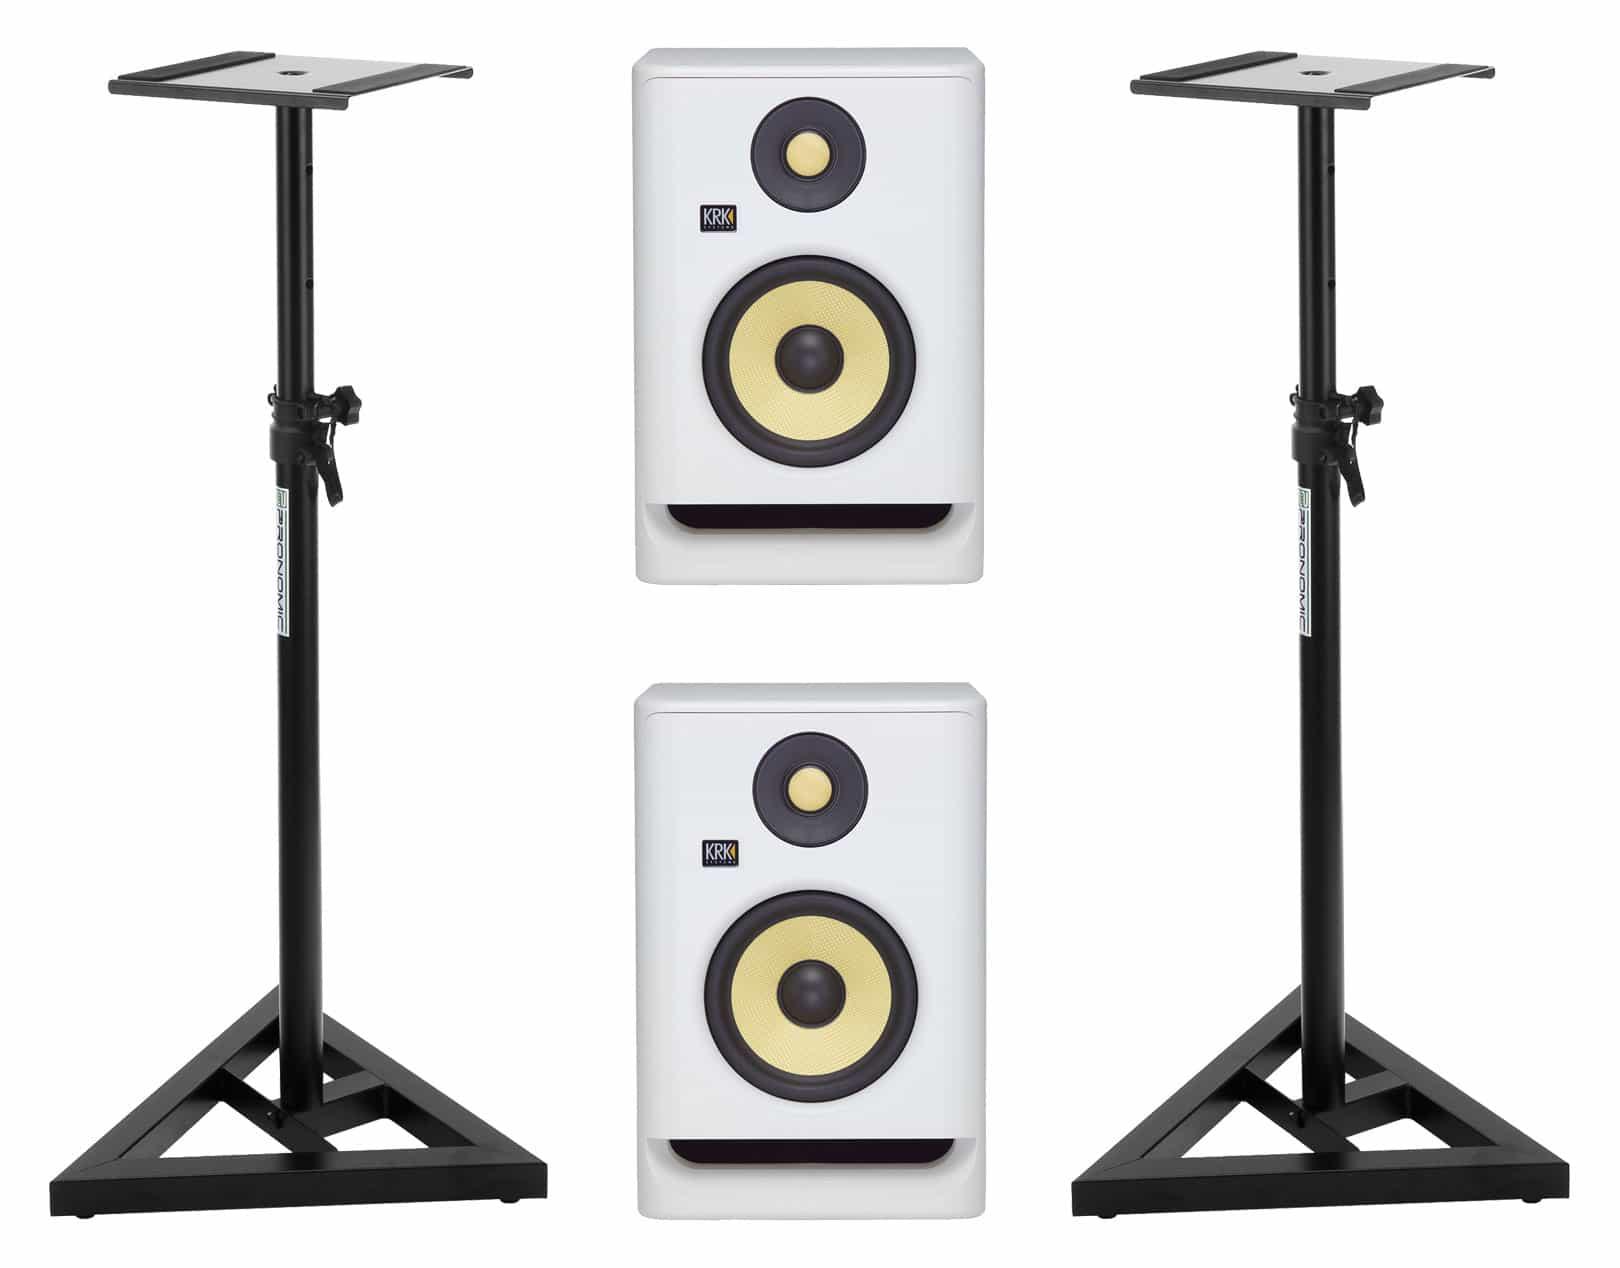 Studiomonitore - KRK ROKIT RP5 G4 White Noise Stativ Set - Onlineshop Musikhaus Kirstein